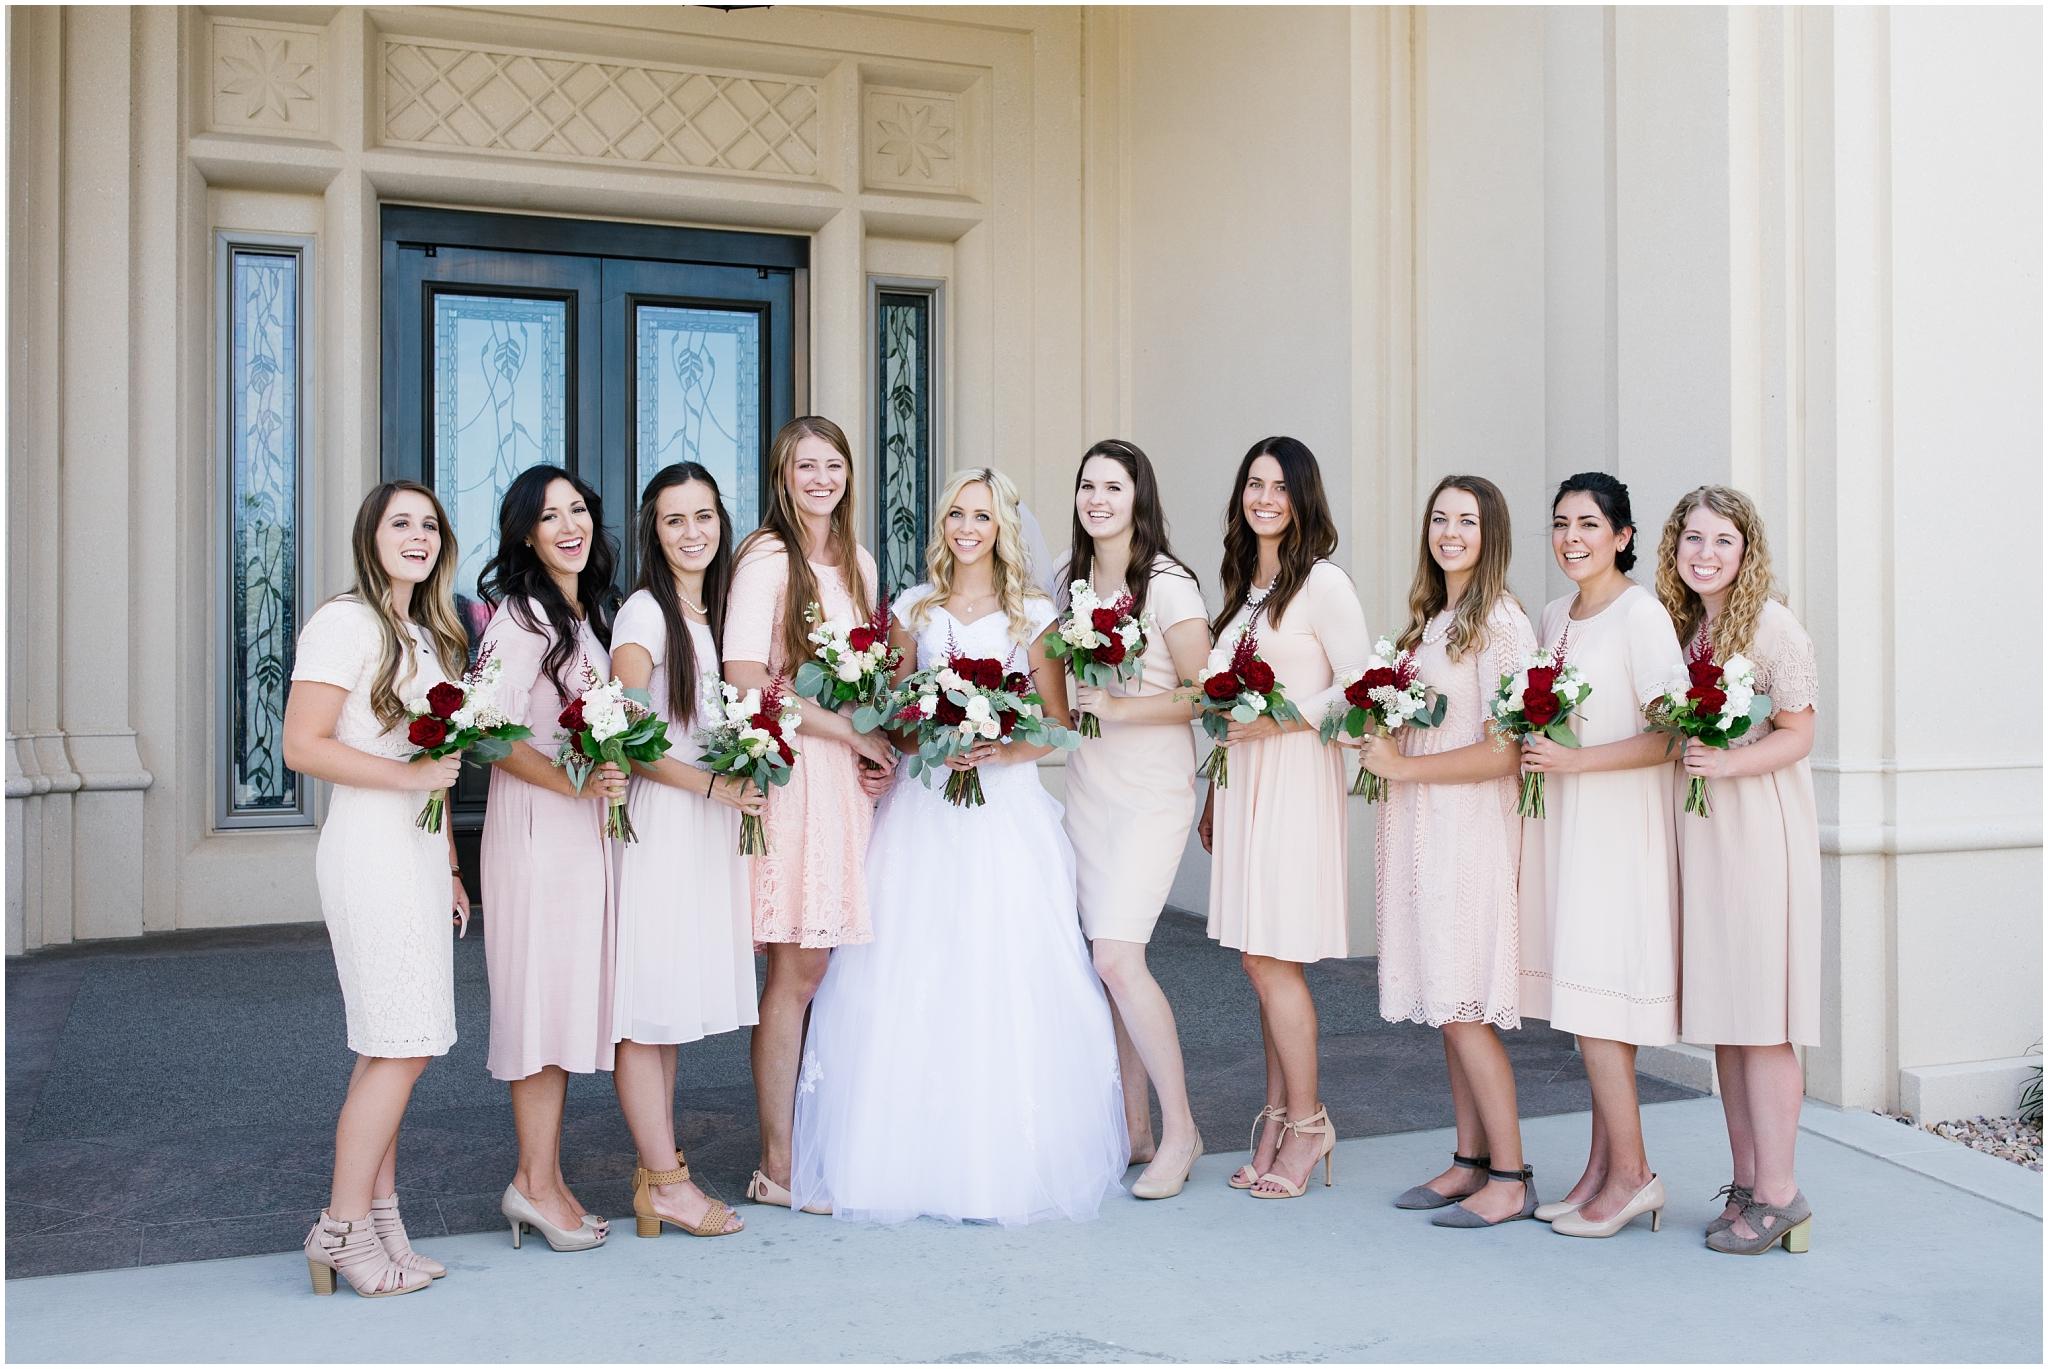 HannahChaseWedding-64_Lizzie-B-Imagery-Utah-Wedding-Photographer-Park-City-Salt-Lake-City-Payson-Temple-Clarion-Garden-Center.jpg